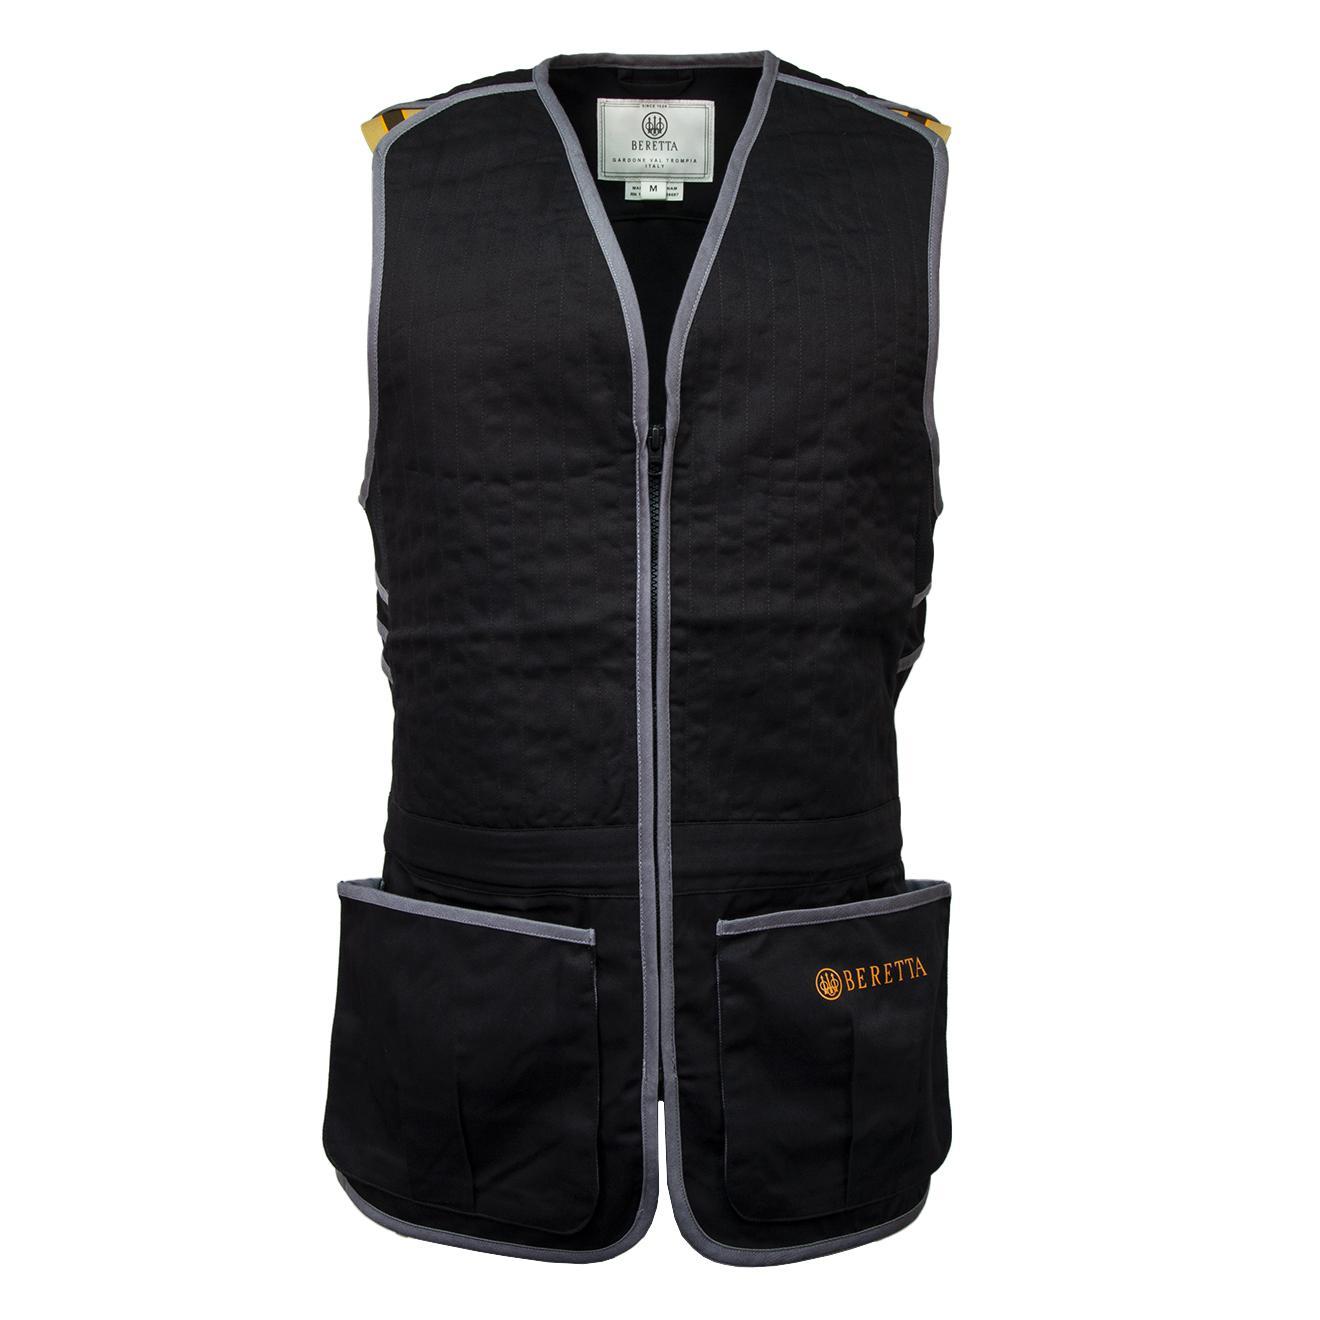 Beretta-Trap-Cotton-Shooting-Vest-Black-Grey-GT083T1553-10925-001